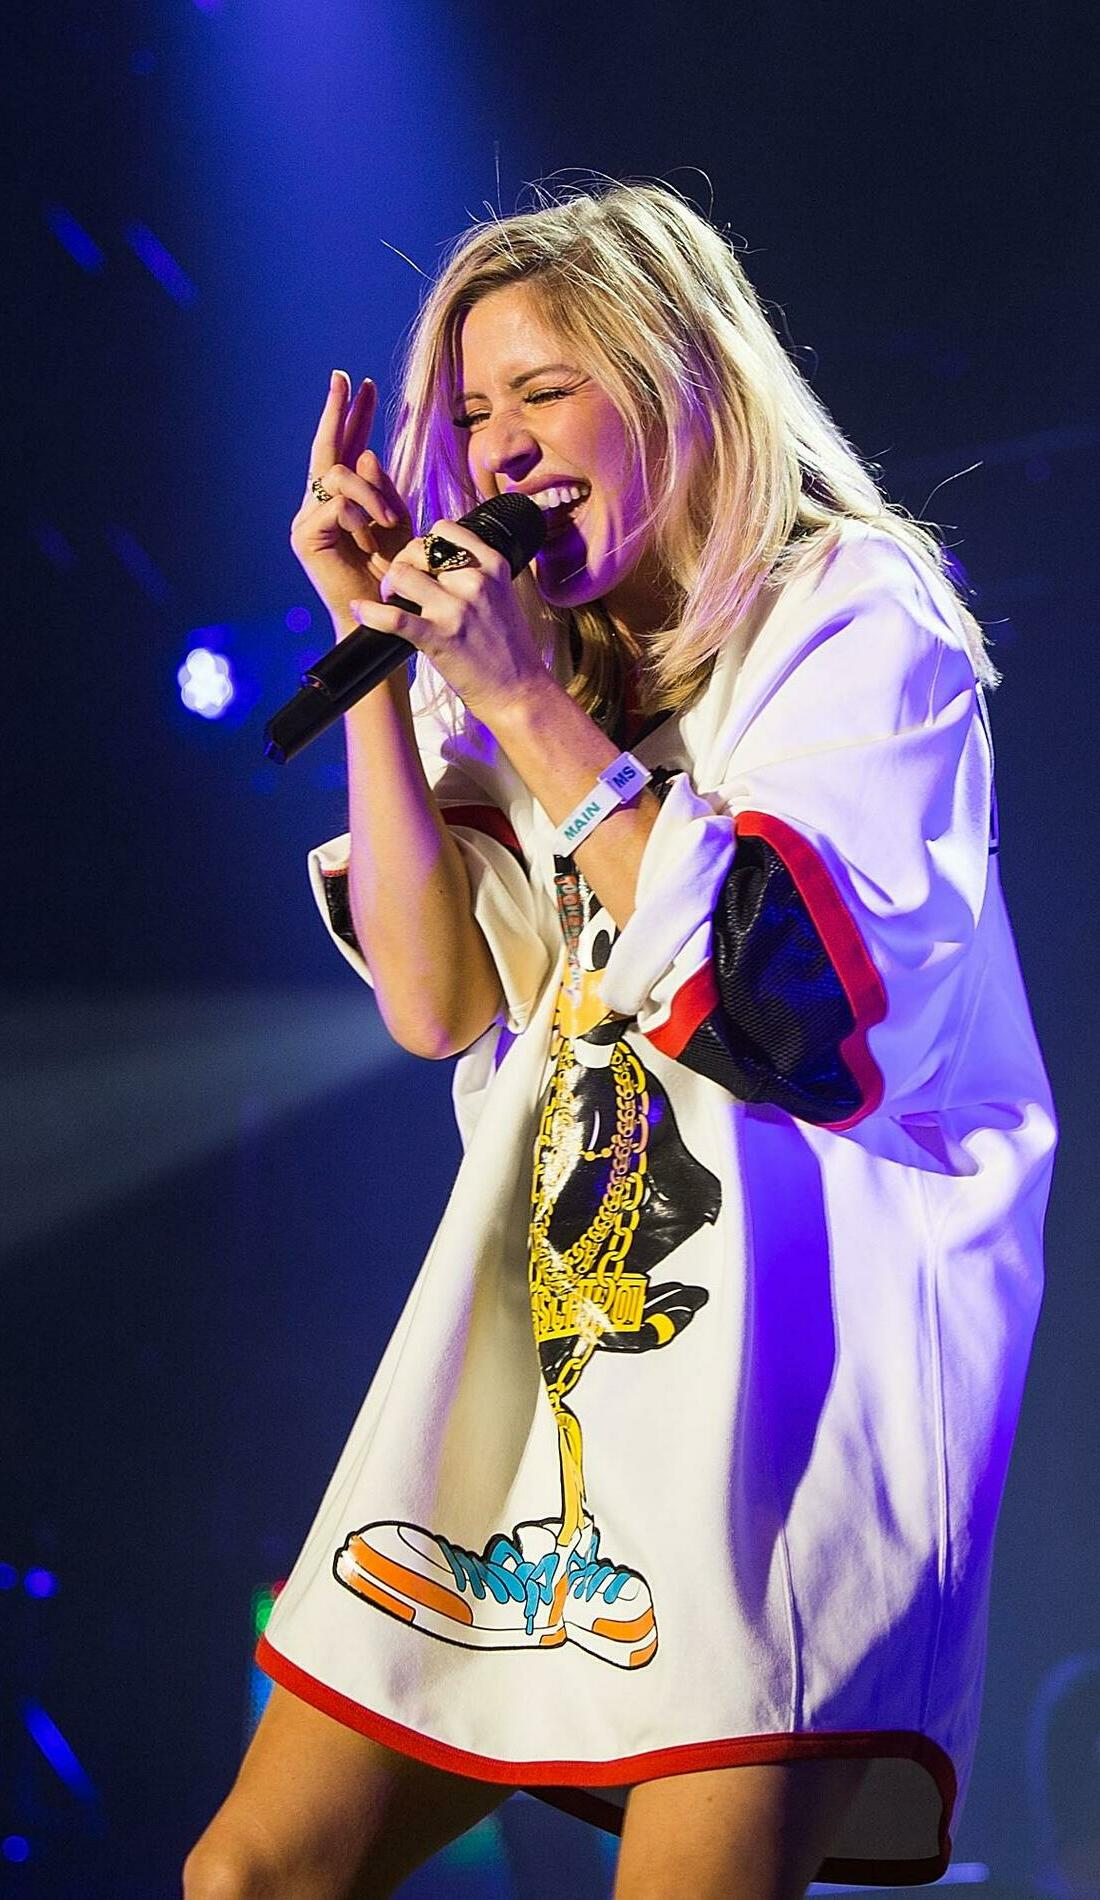 A Ellie Goulding live event